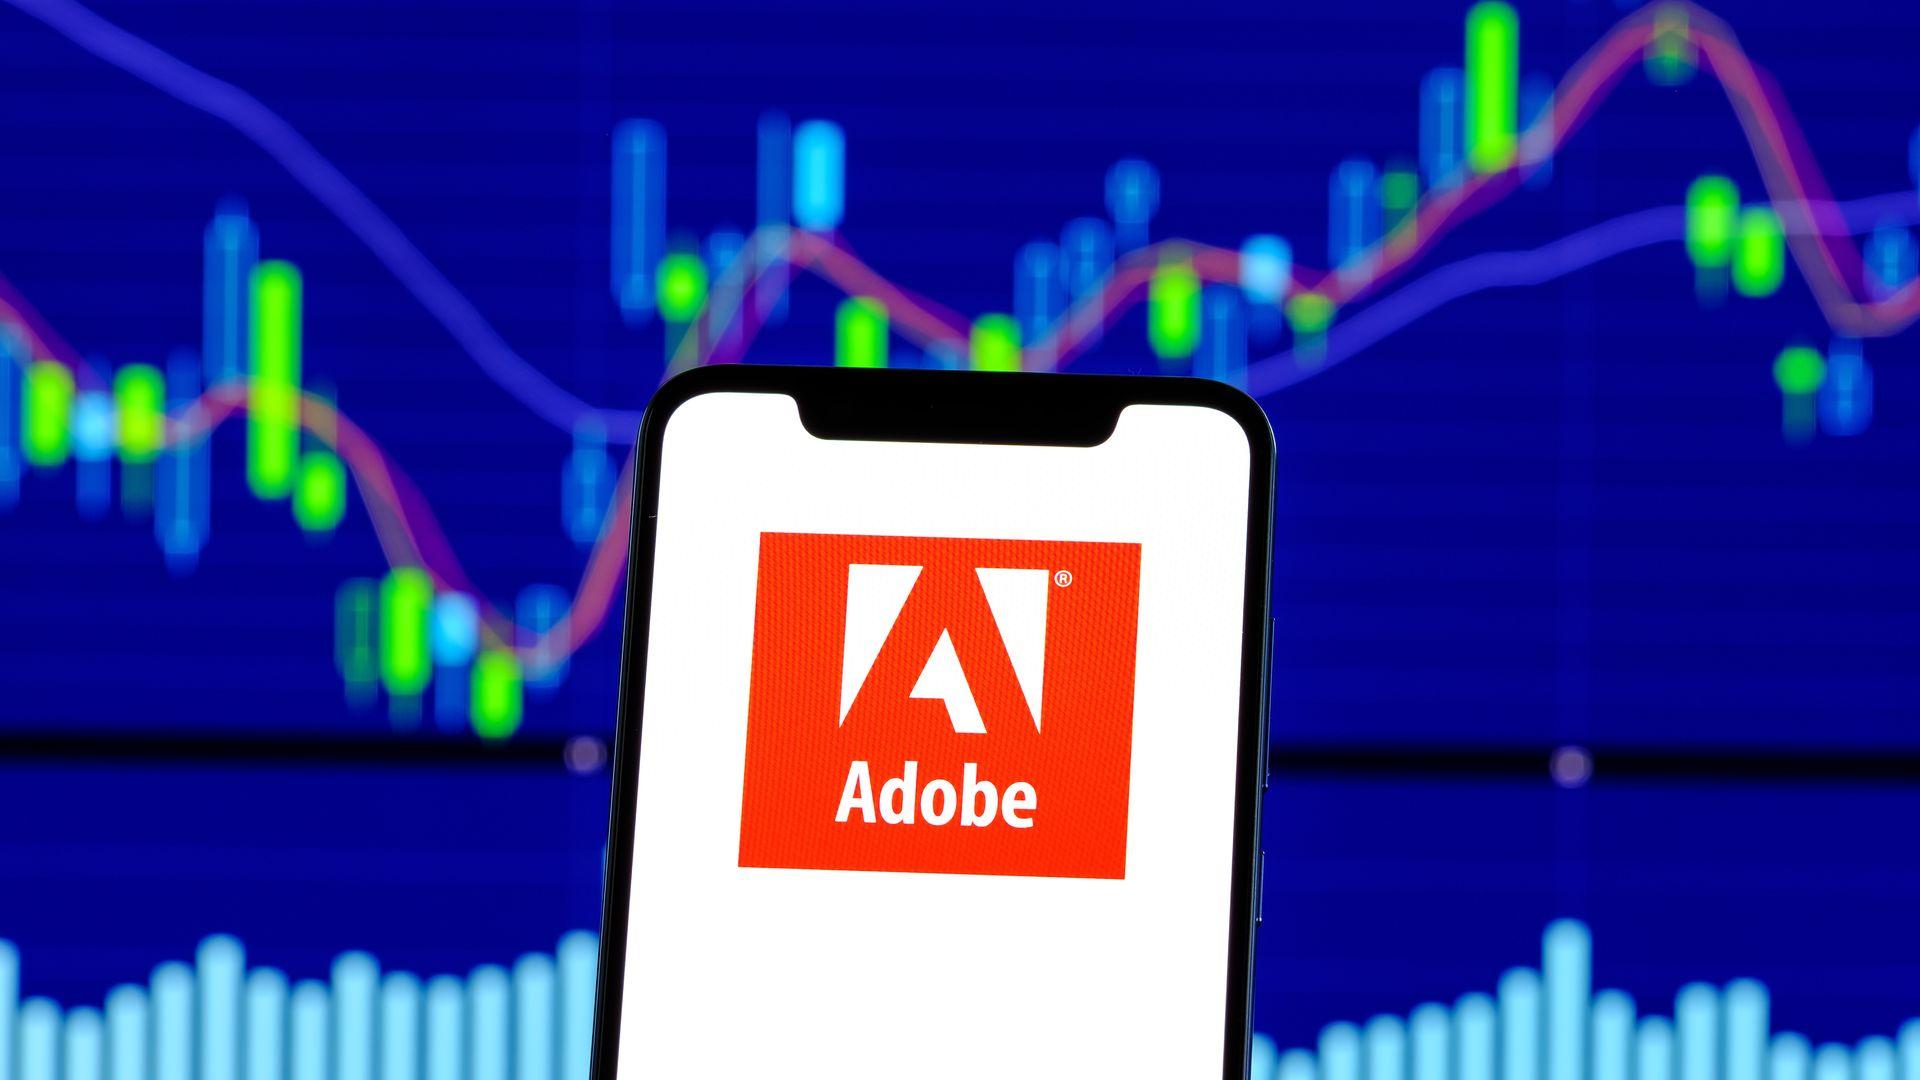 Adobe Photoshop - Axios